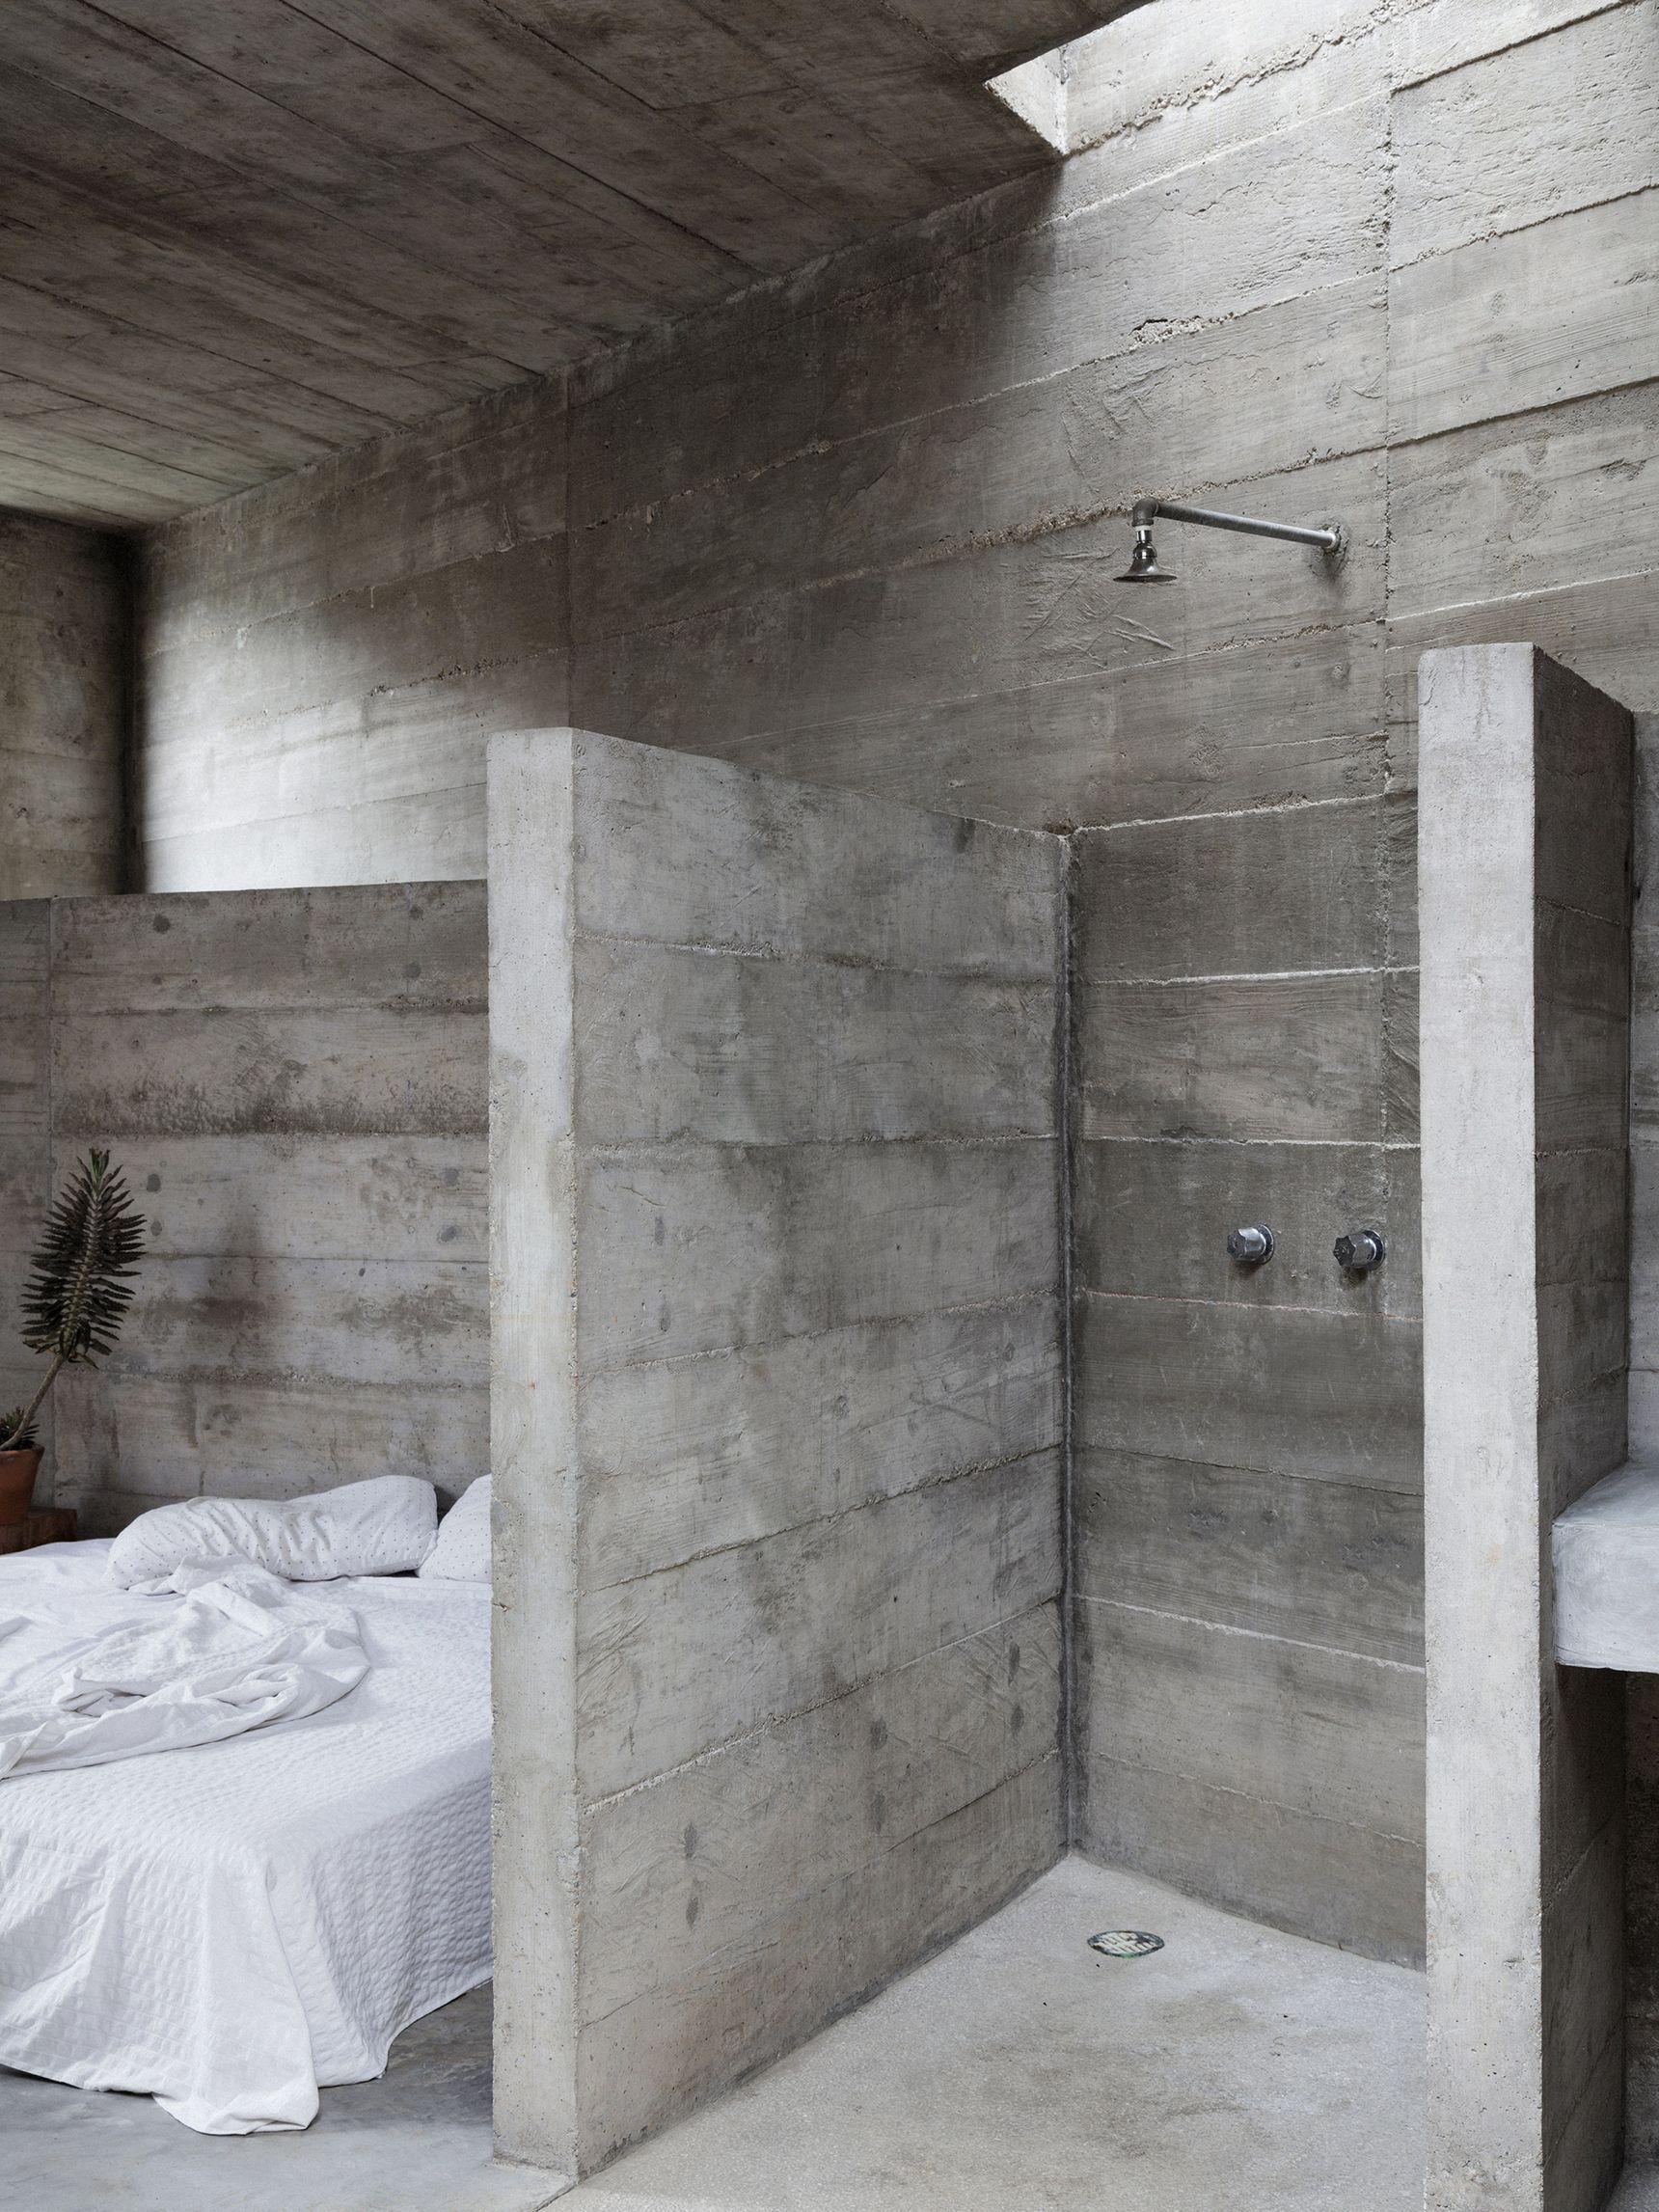 Brutalist Concrete Home Intrigues In Mexico Concrete Interiors Concrete Houses Bathrooms Remodel